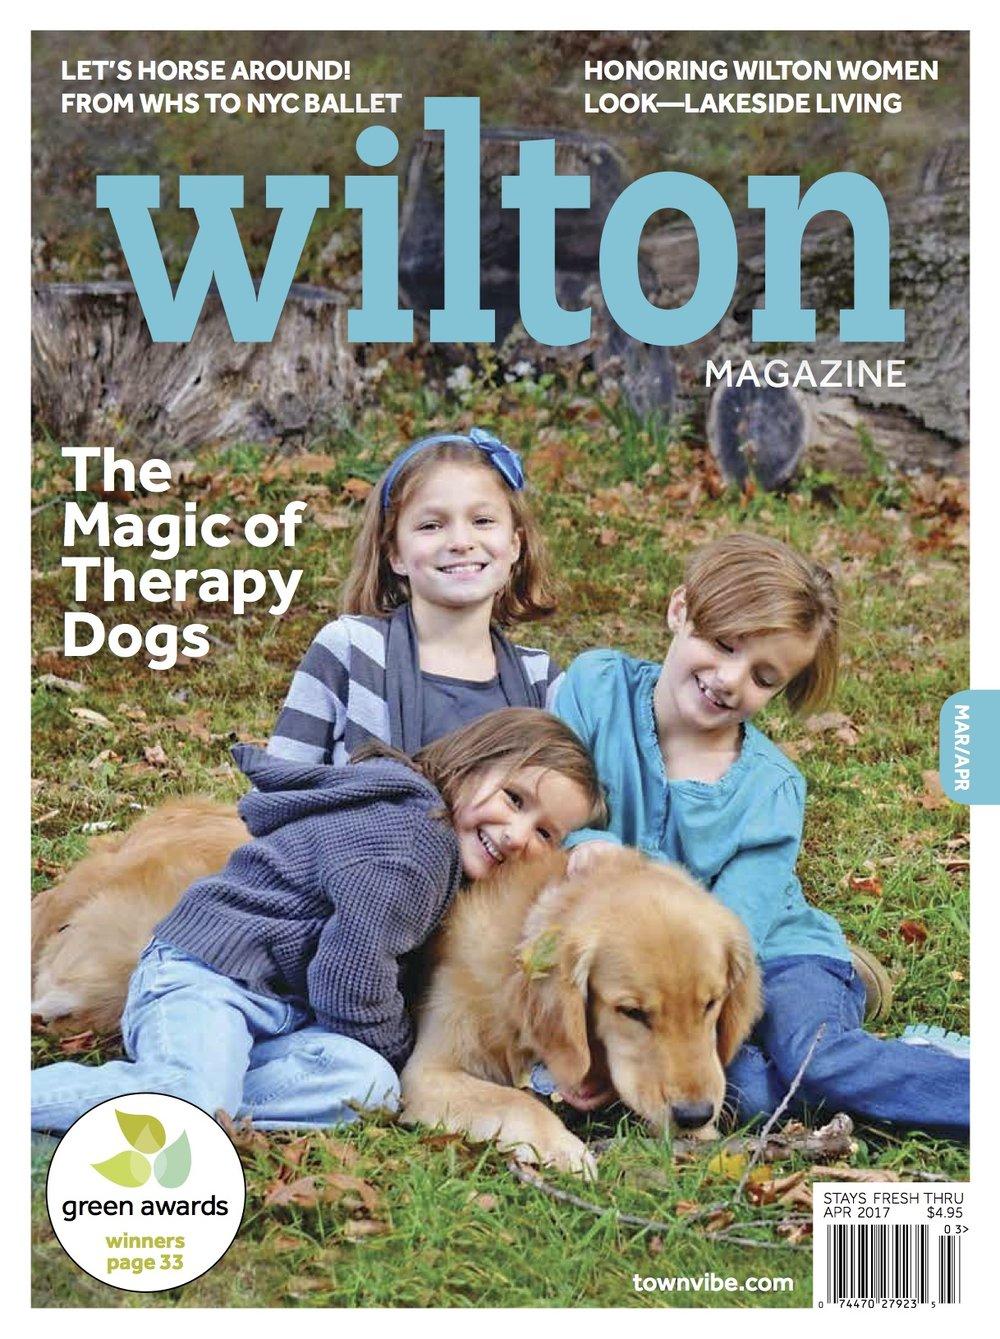 Wilton Magazine, March/April 2017